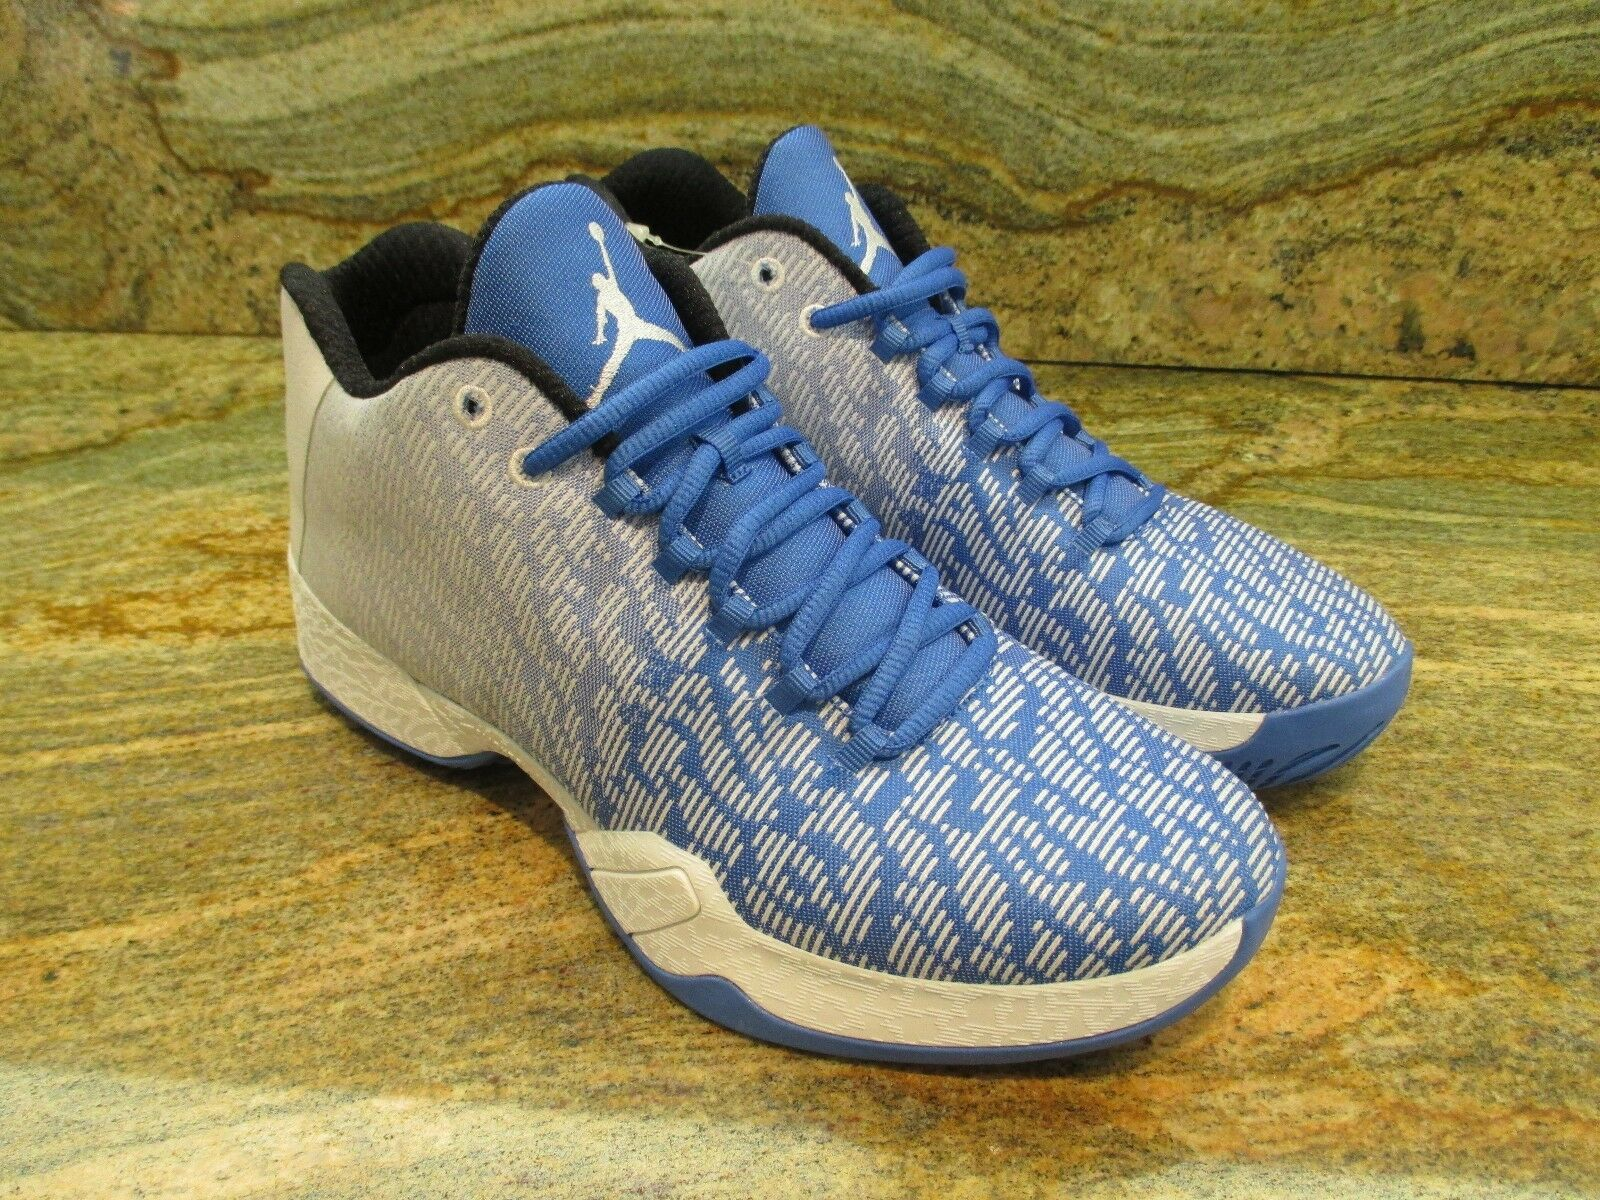 UNRELEASED Nike Air Jordan XX9 Low Sample SZ 9 UNC PE Promo Soar Blue Tarheels